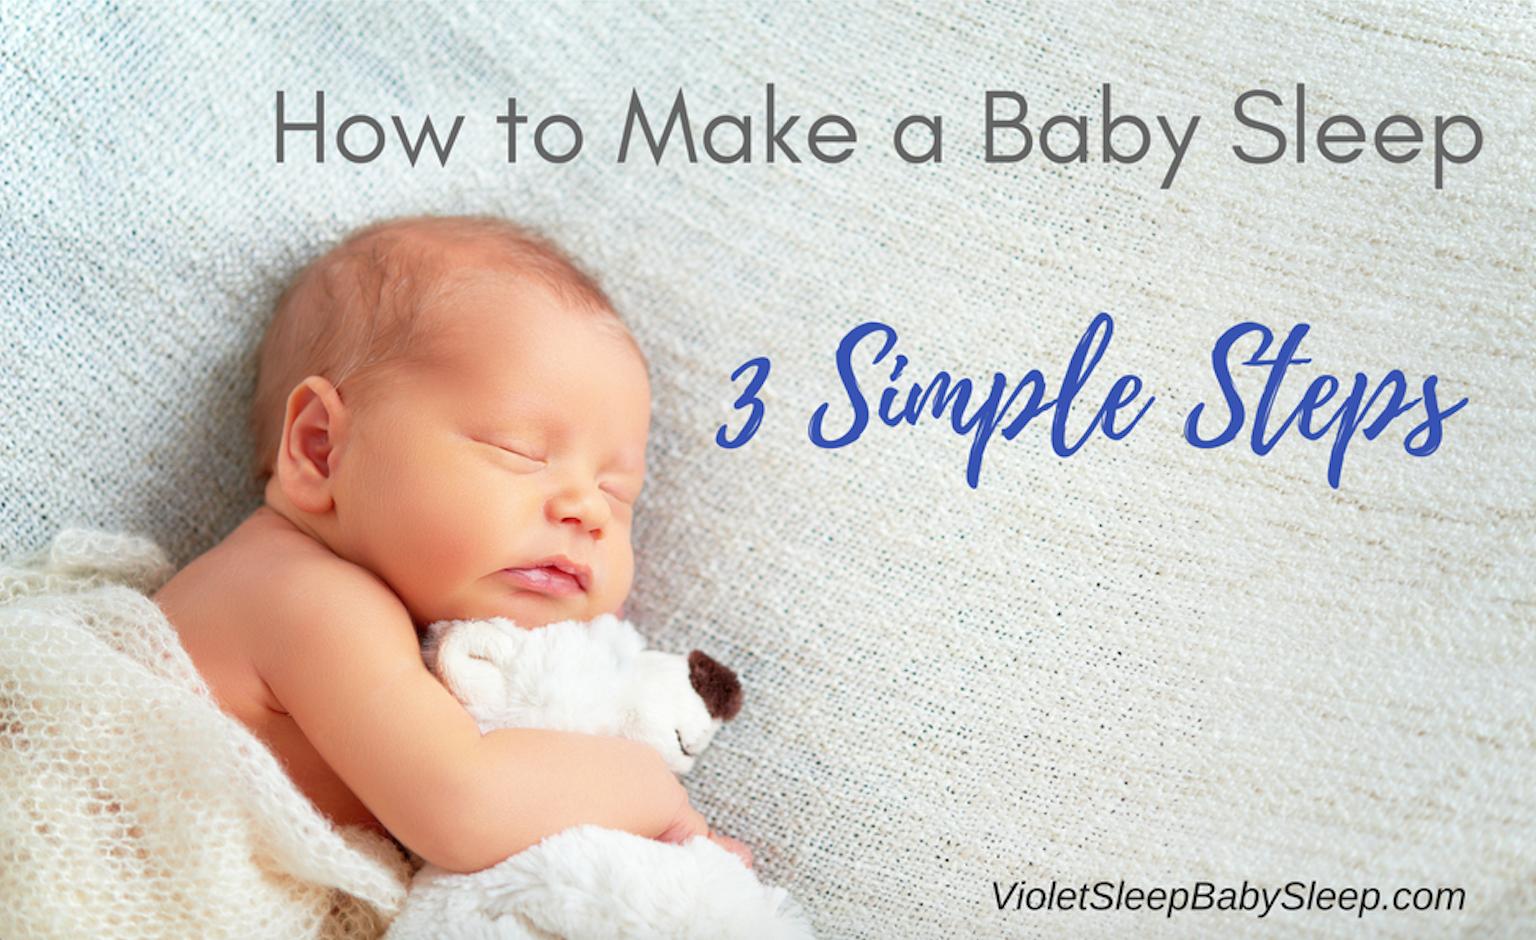 How to make a baby sleep